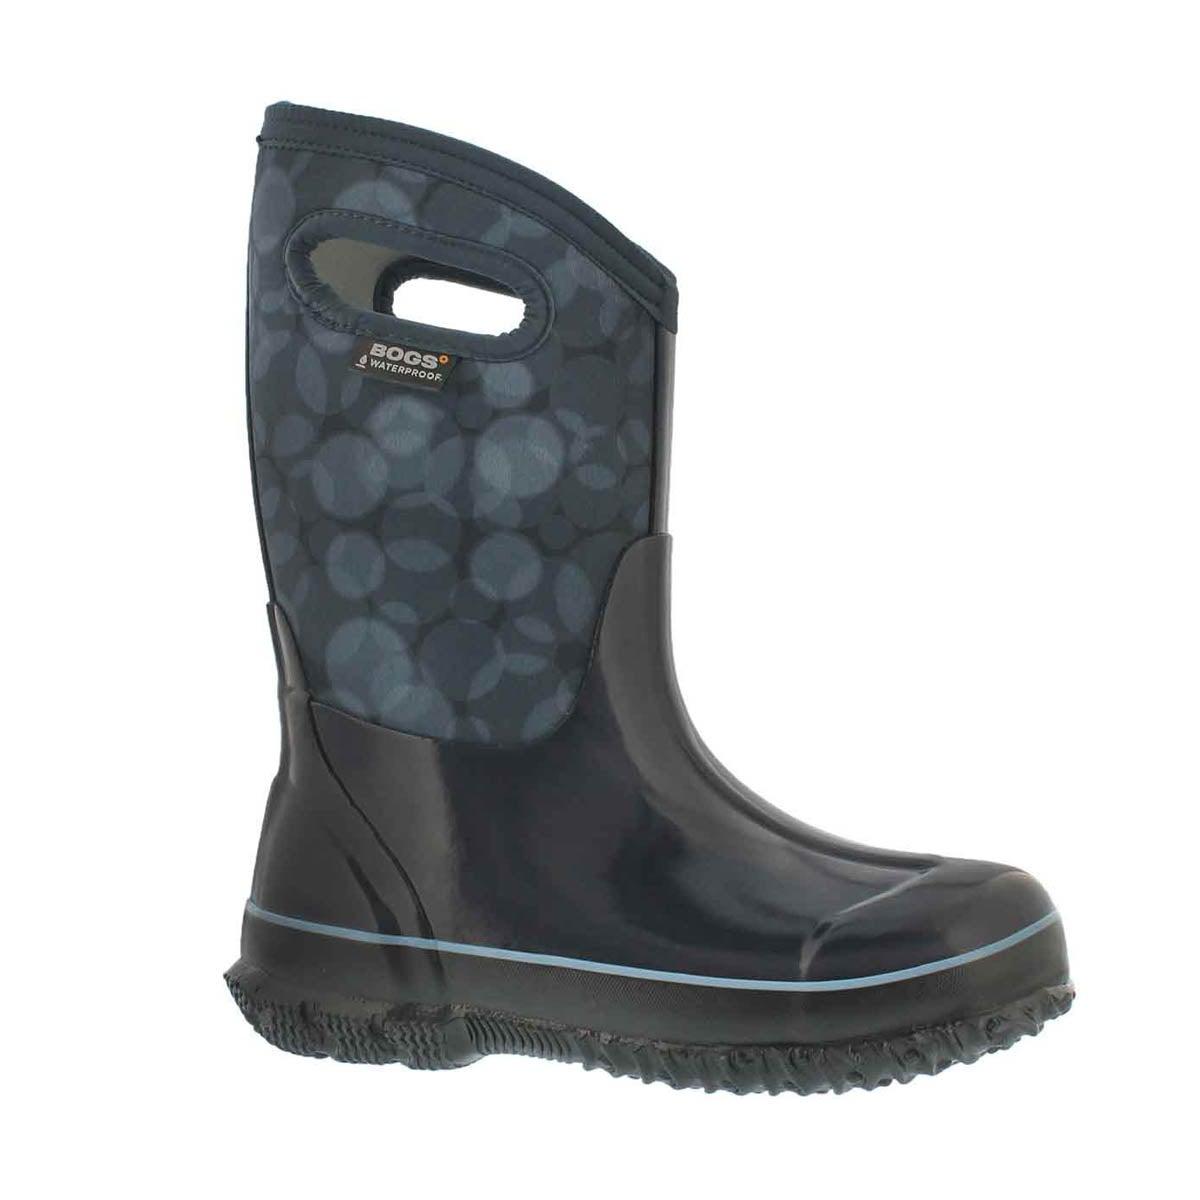 Girls' CLASSIC RN blue multi waterproof boots